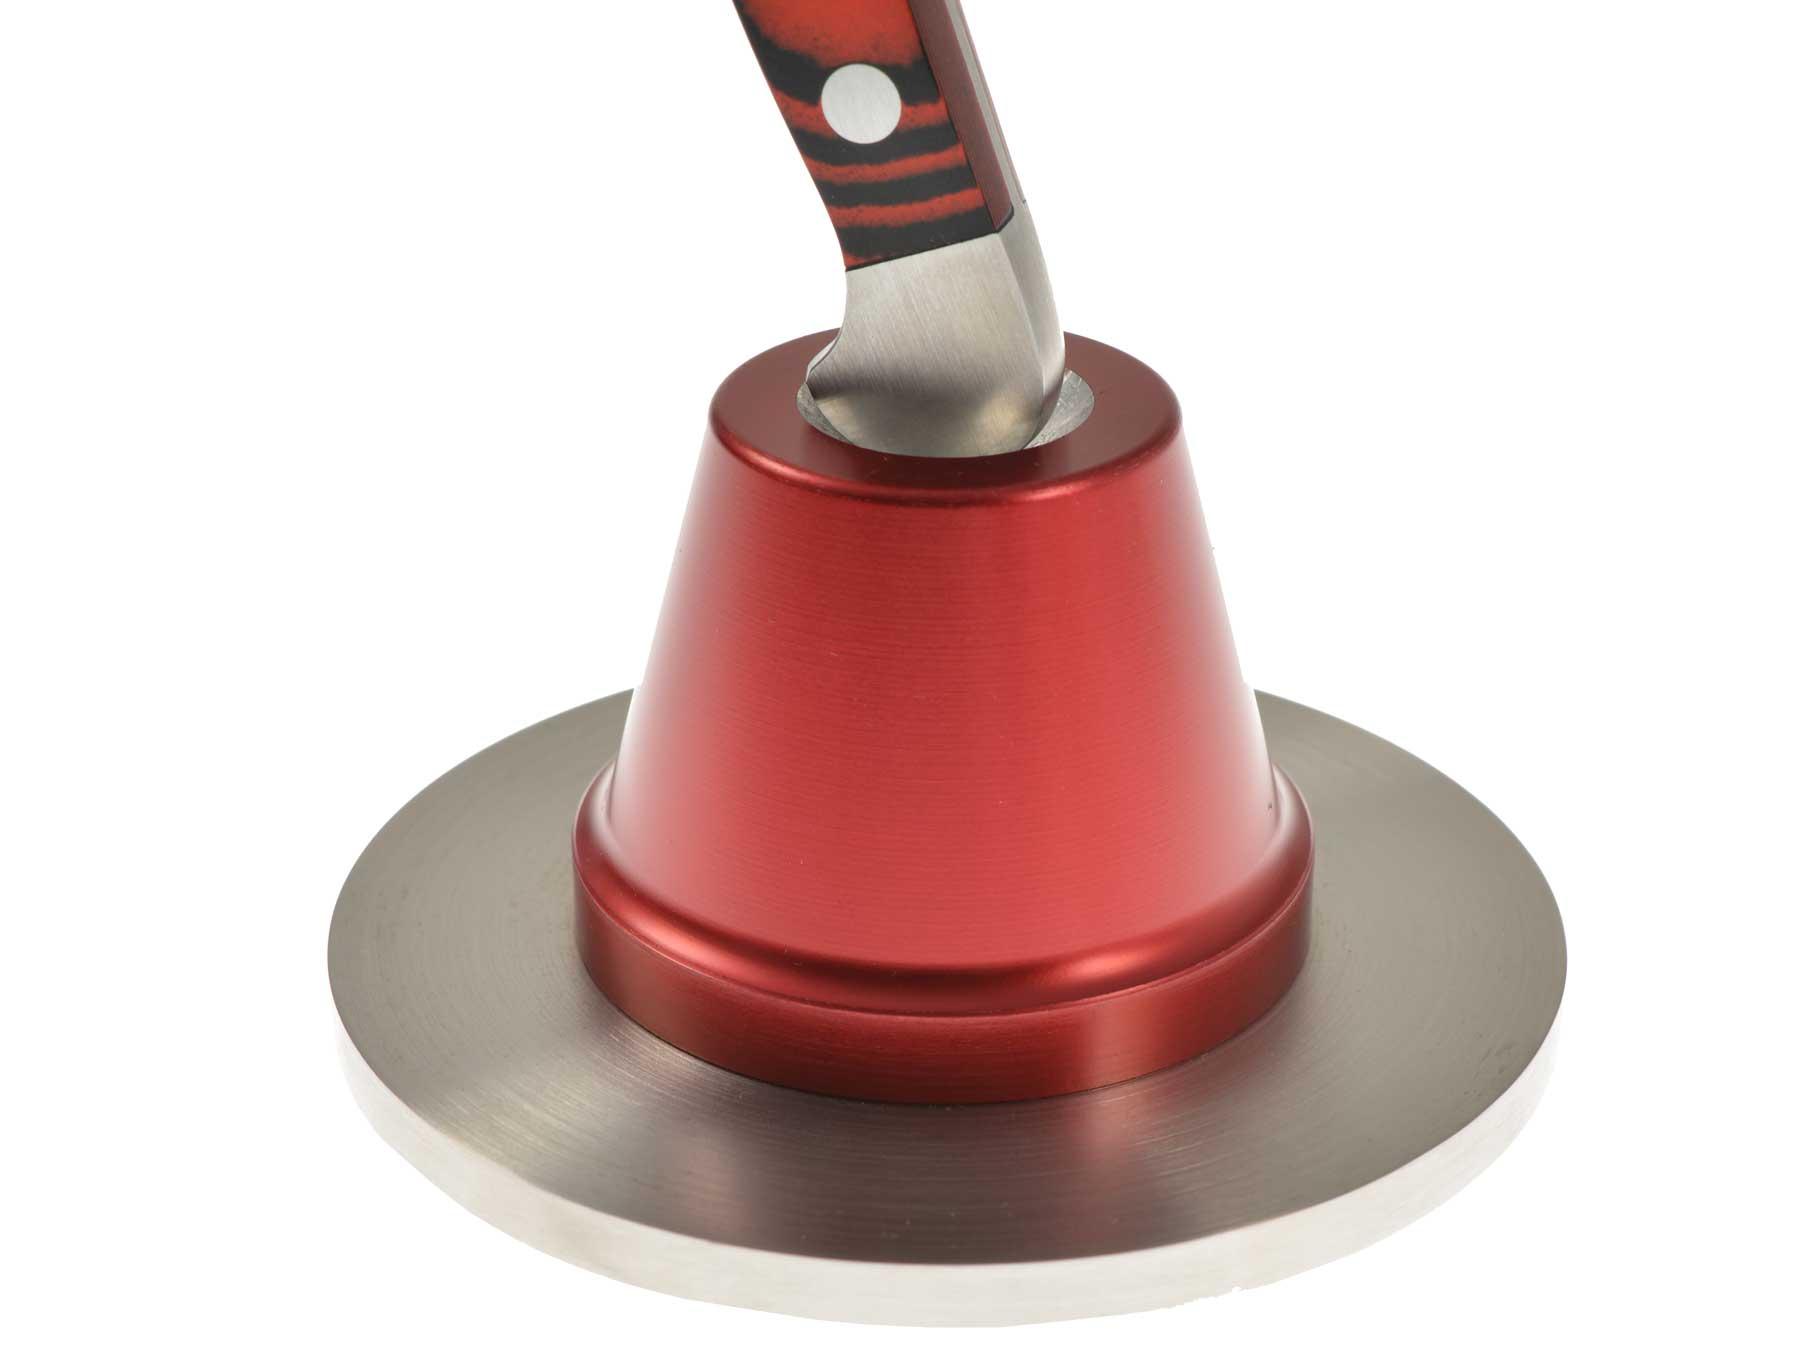 Güde Messerständer Vesuv rot